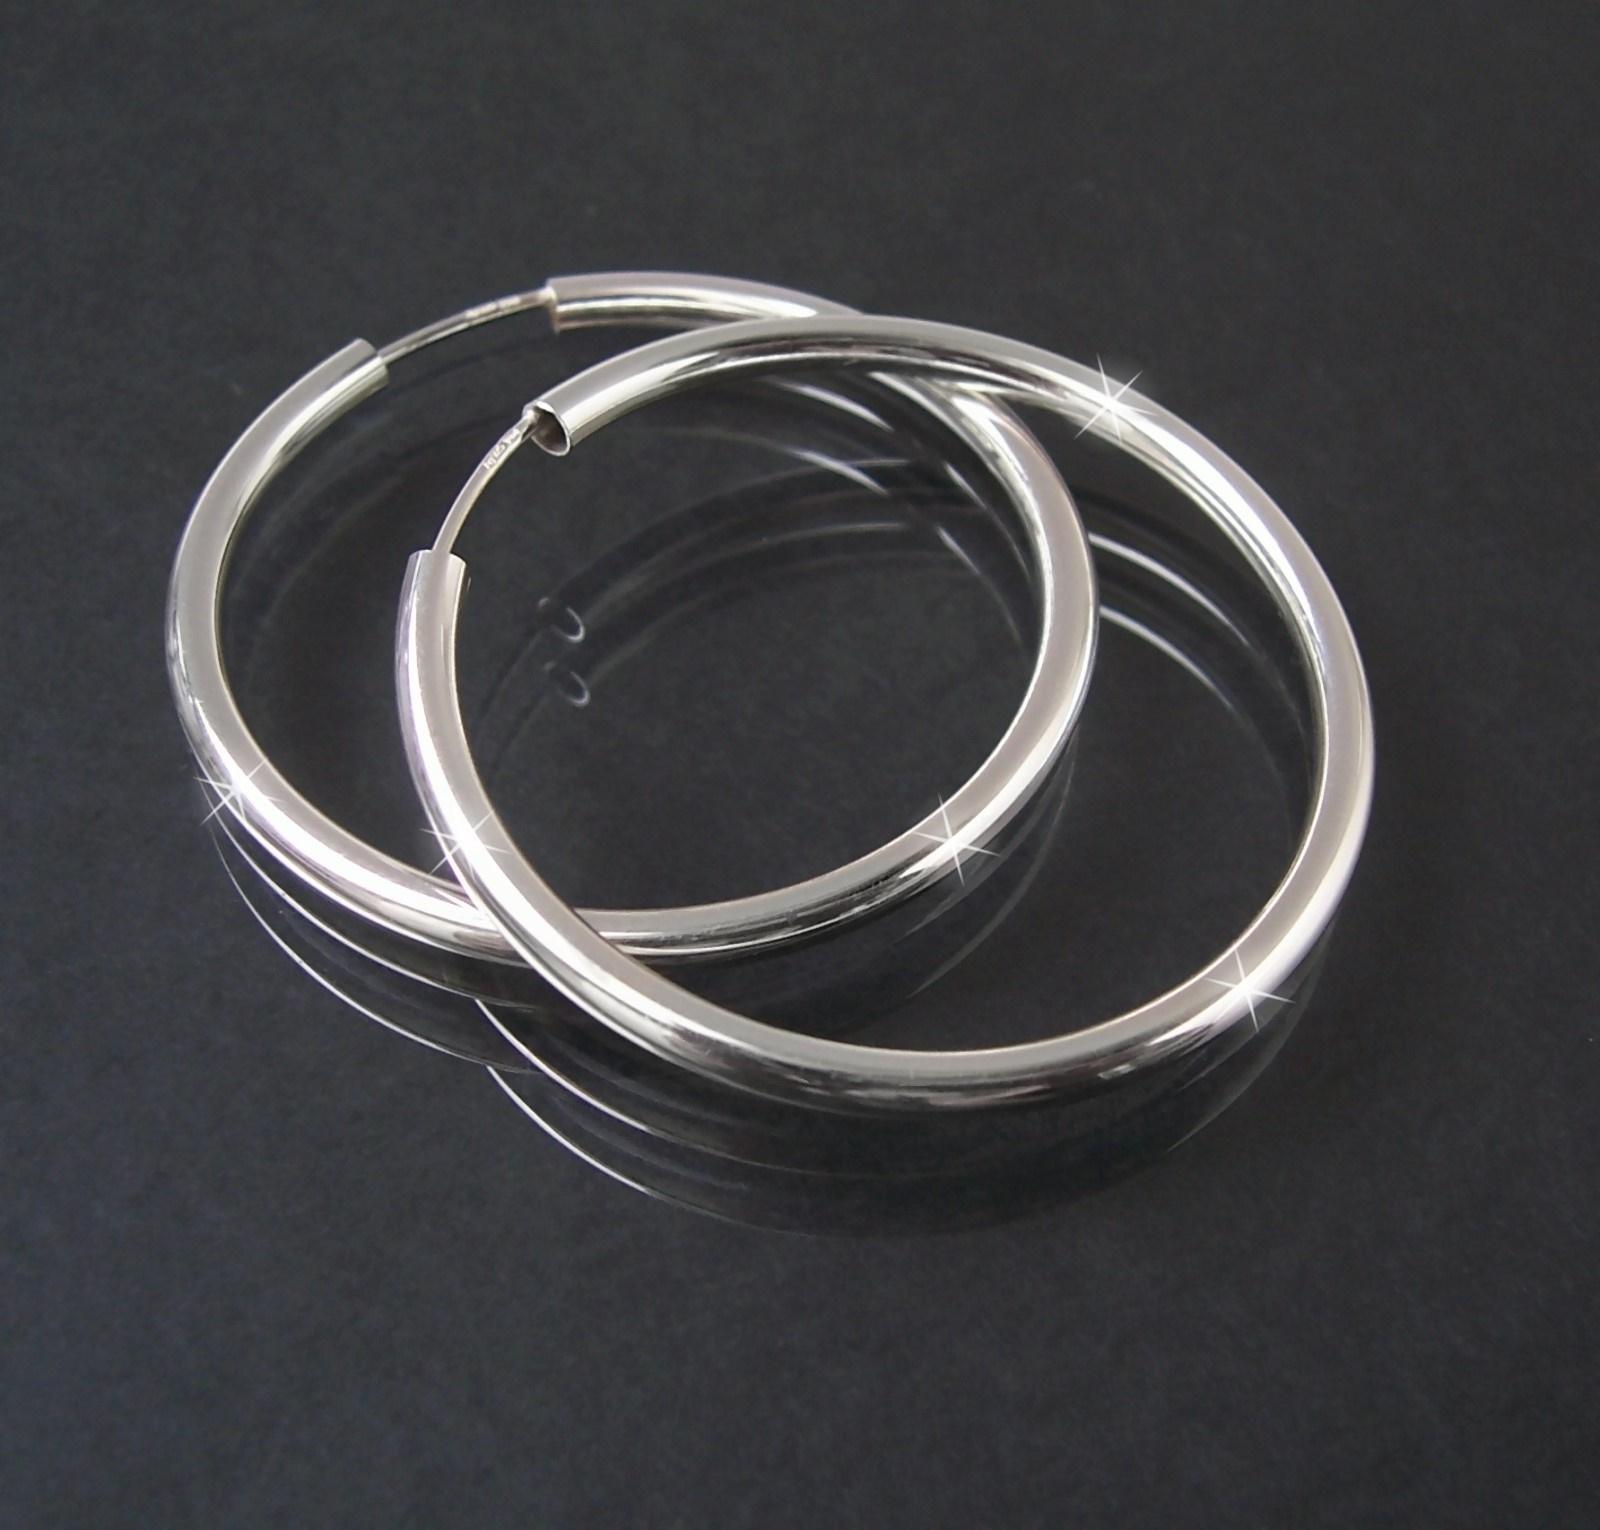 Creolen Silber 925 Niklarson Ohrringe 3,5cm Rohrcreolen 14125-35